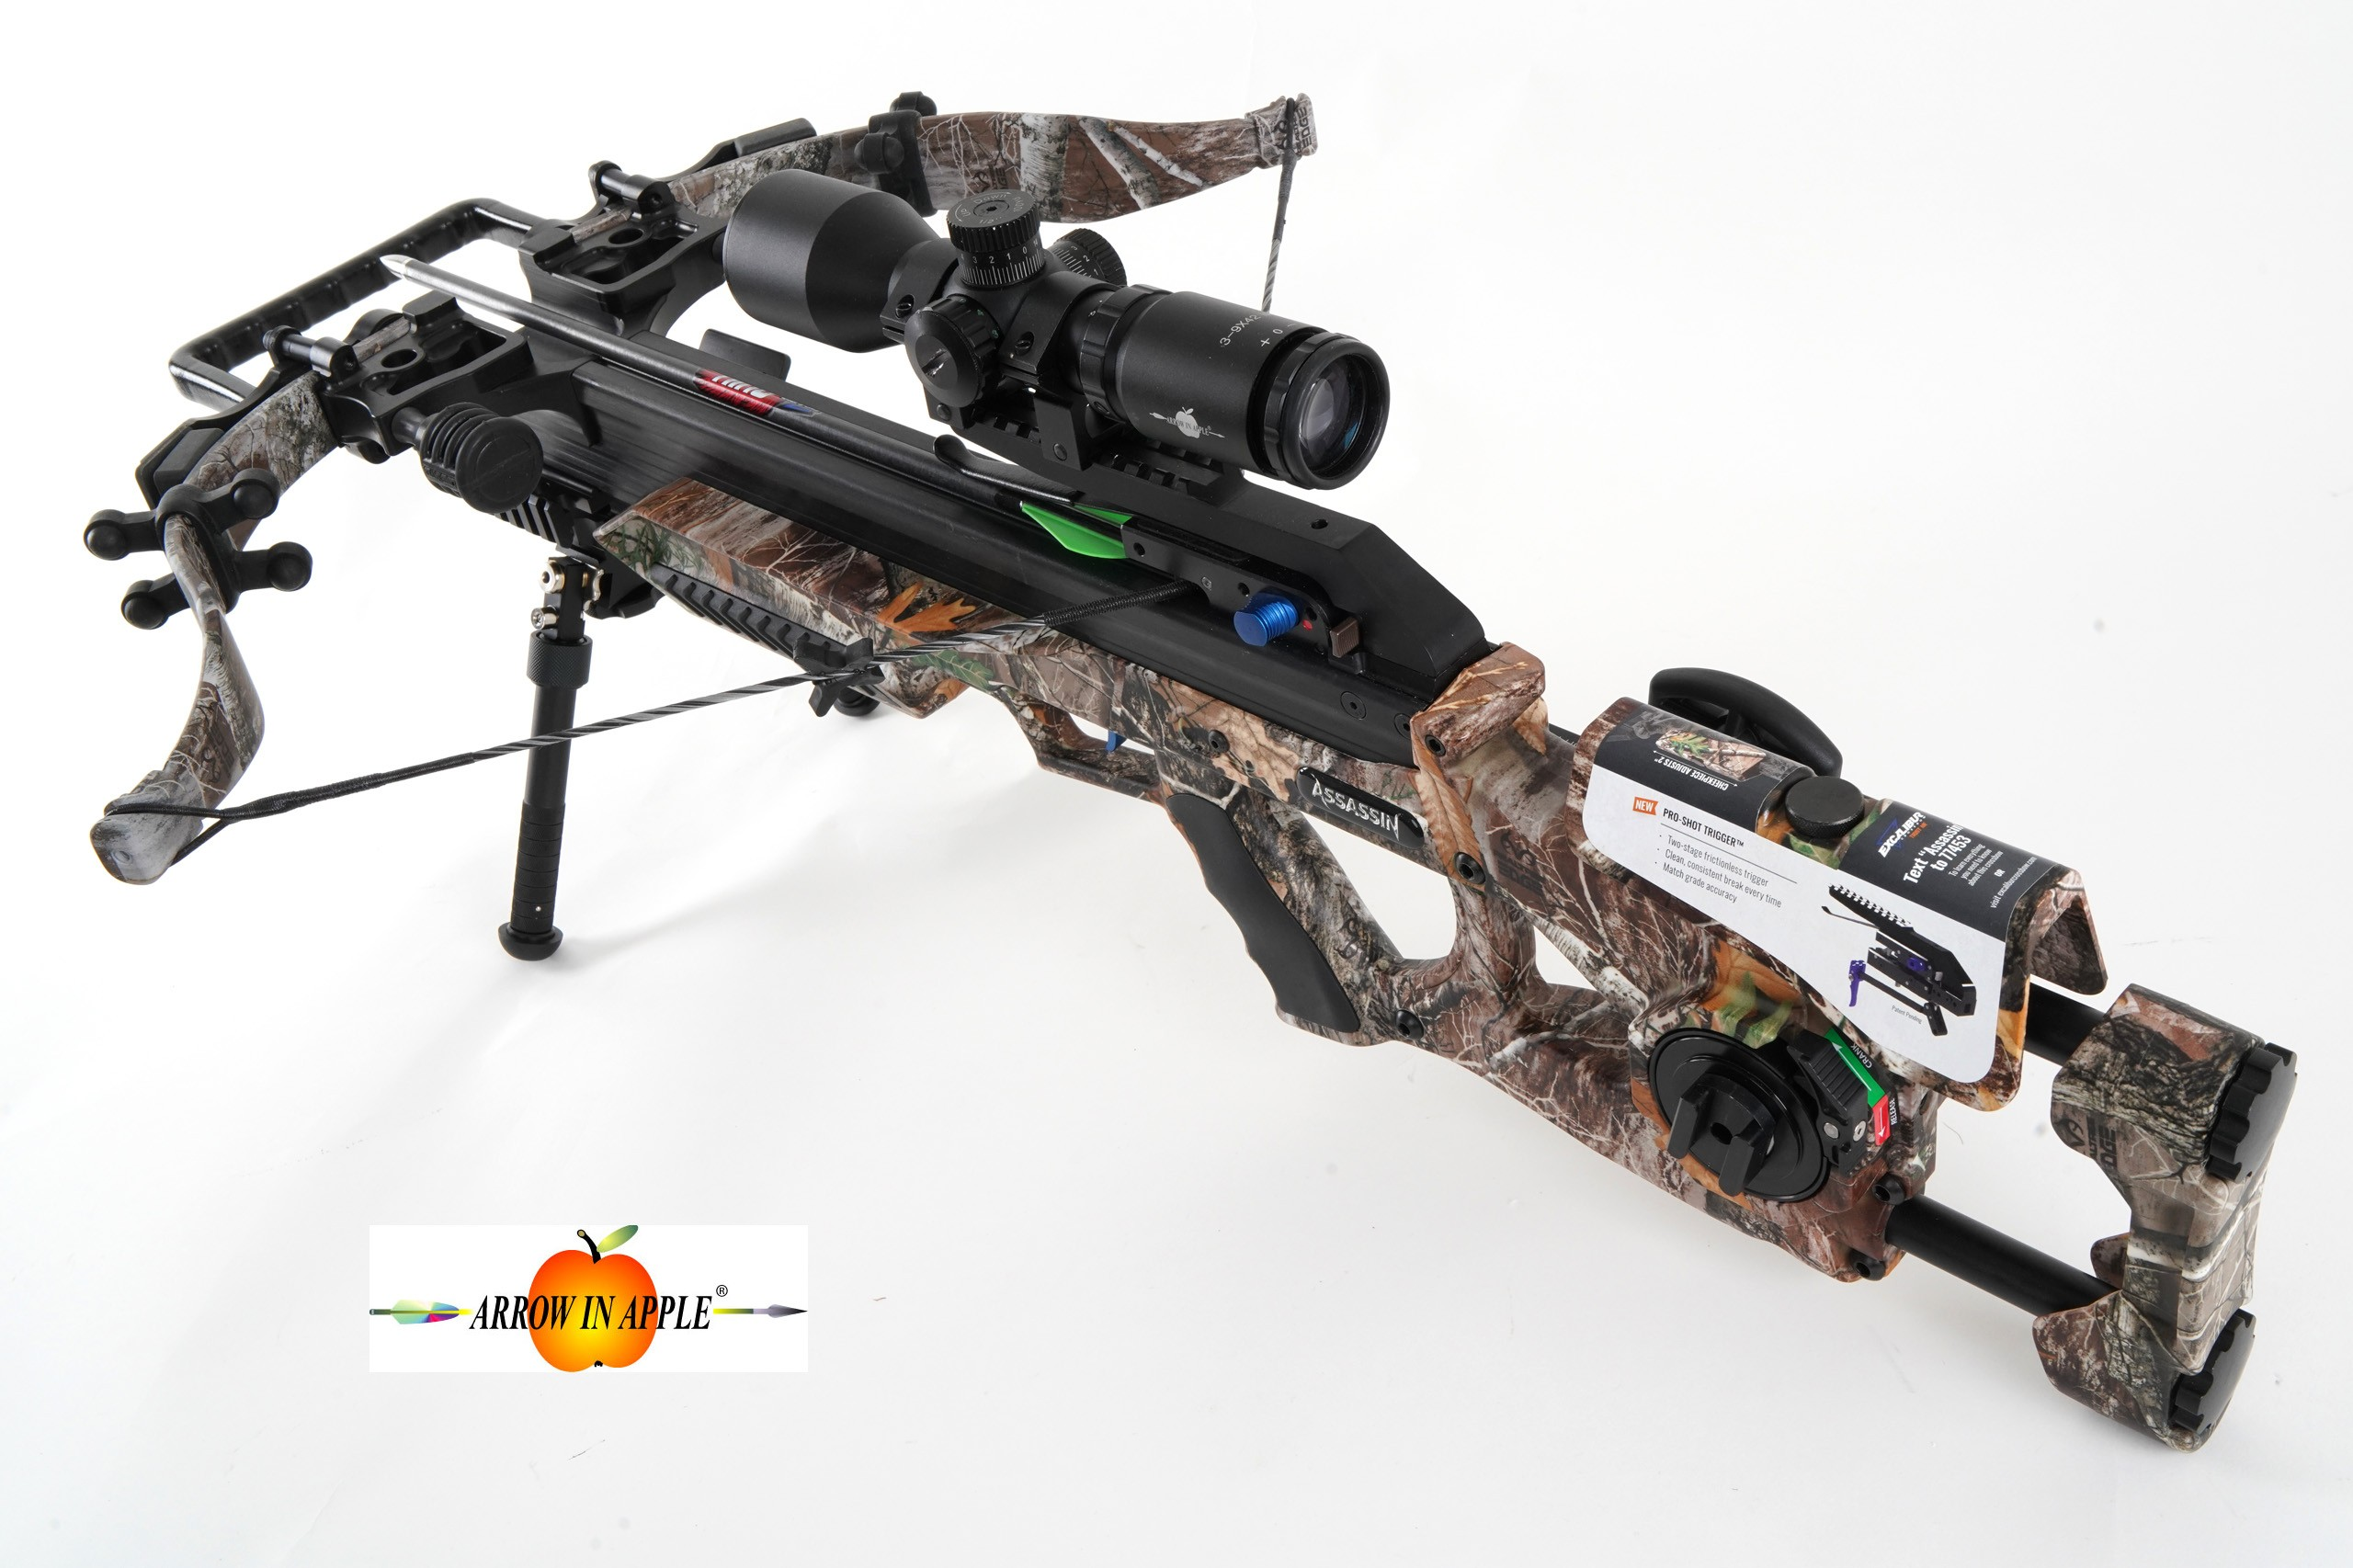 excalibur assassin crossbow at arrow in apple. Black Bedroom Furniture Sets. Home Design Ideas